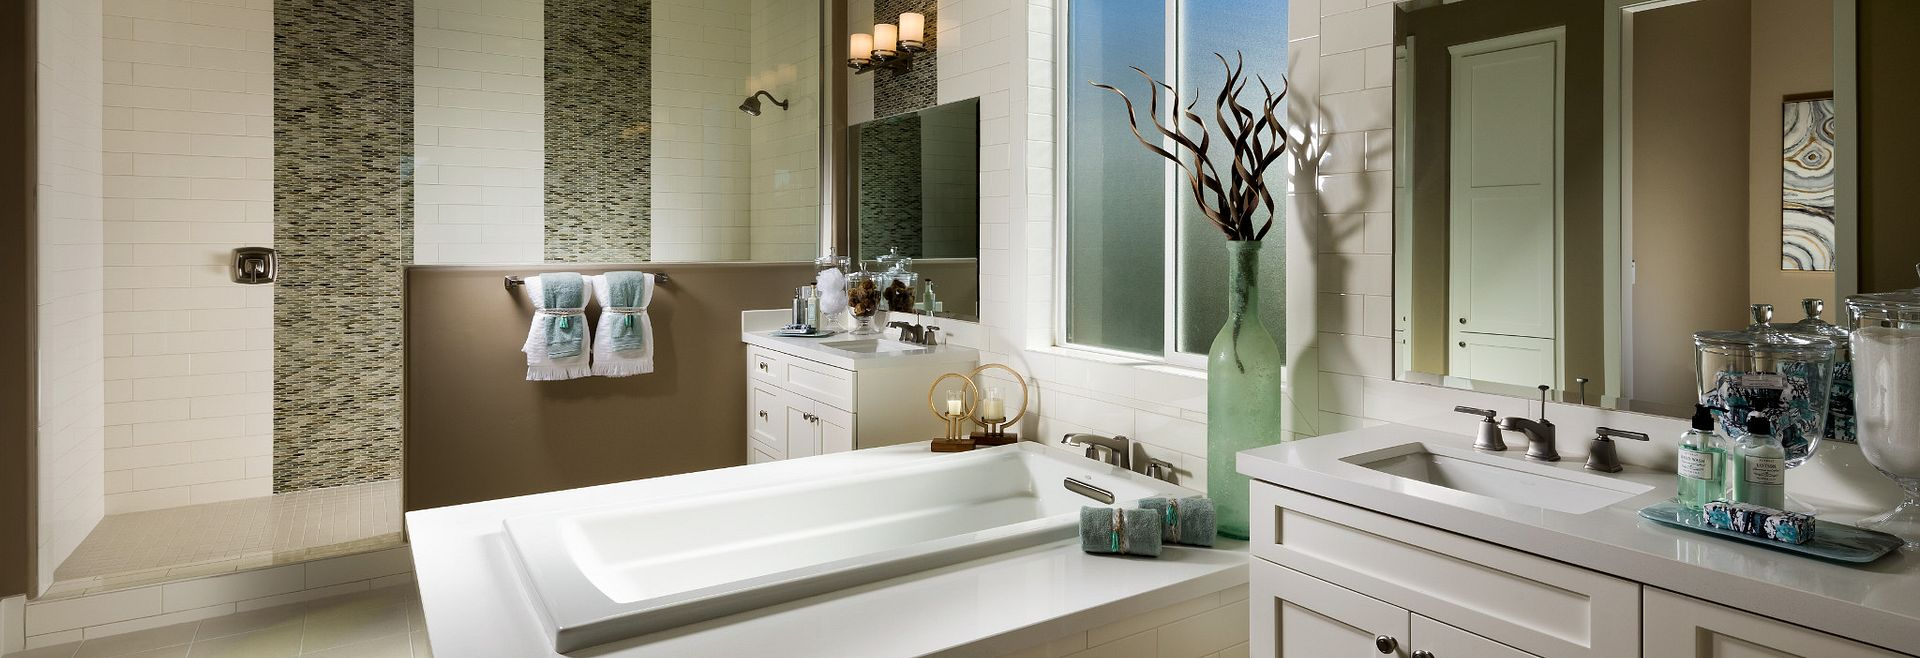 Trilogy Monarch Dunes Riviera Master Bathroom